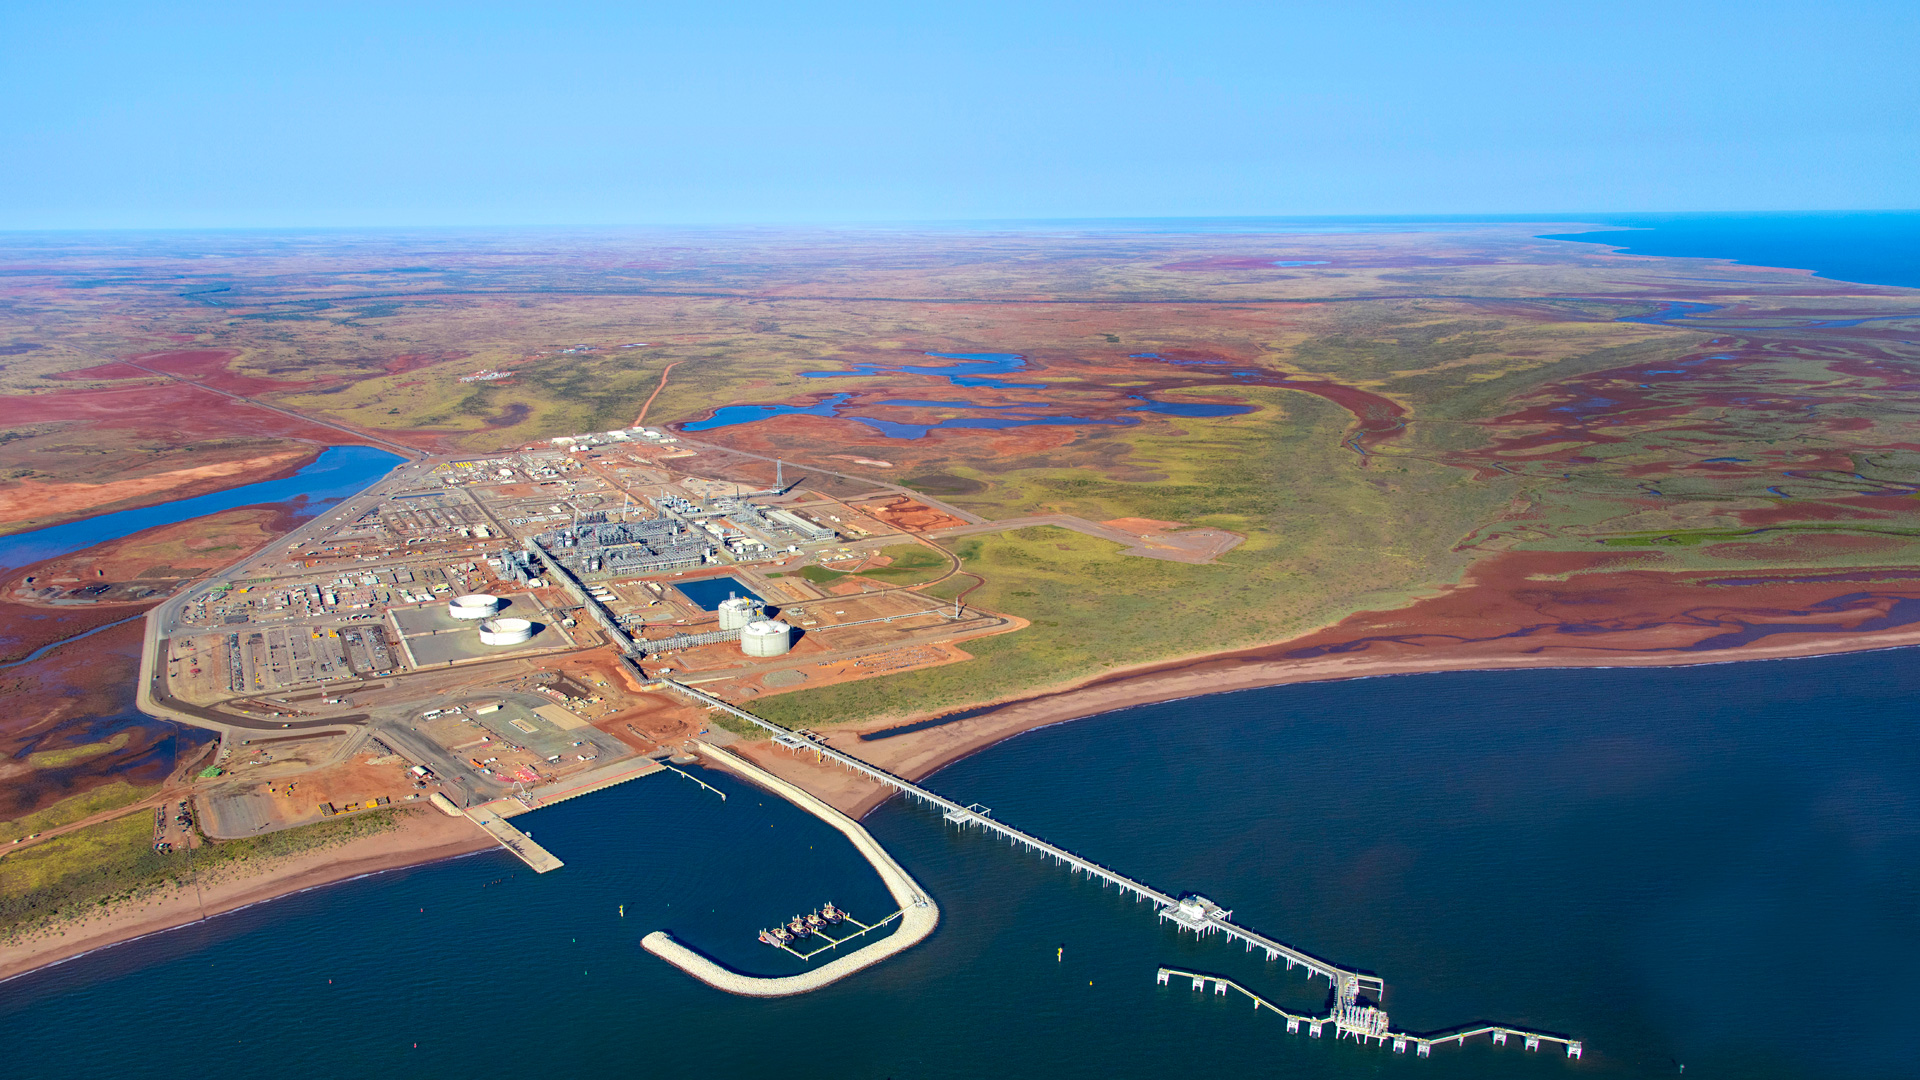 The Wheatstone project area (image courtesy of Chevron)